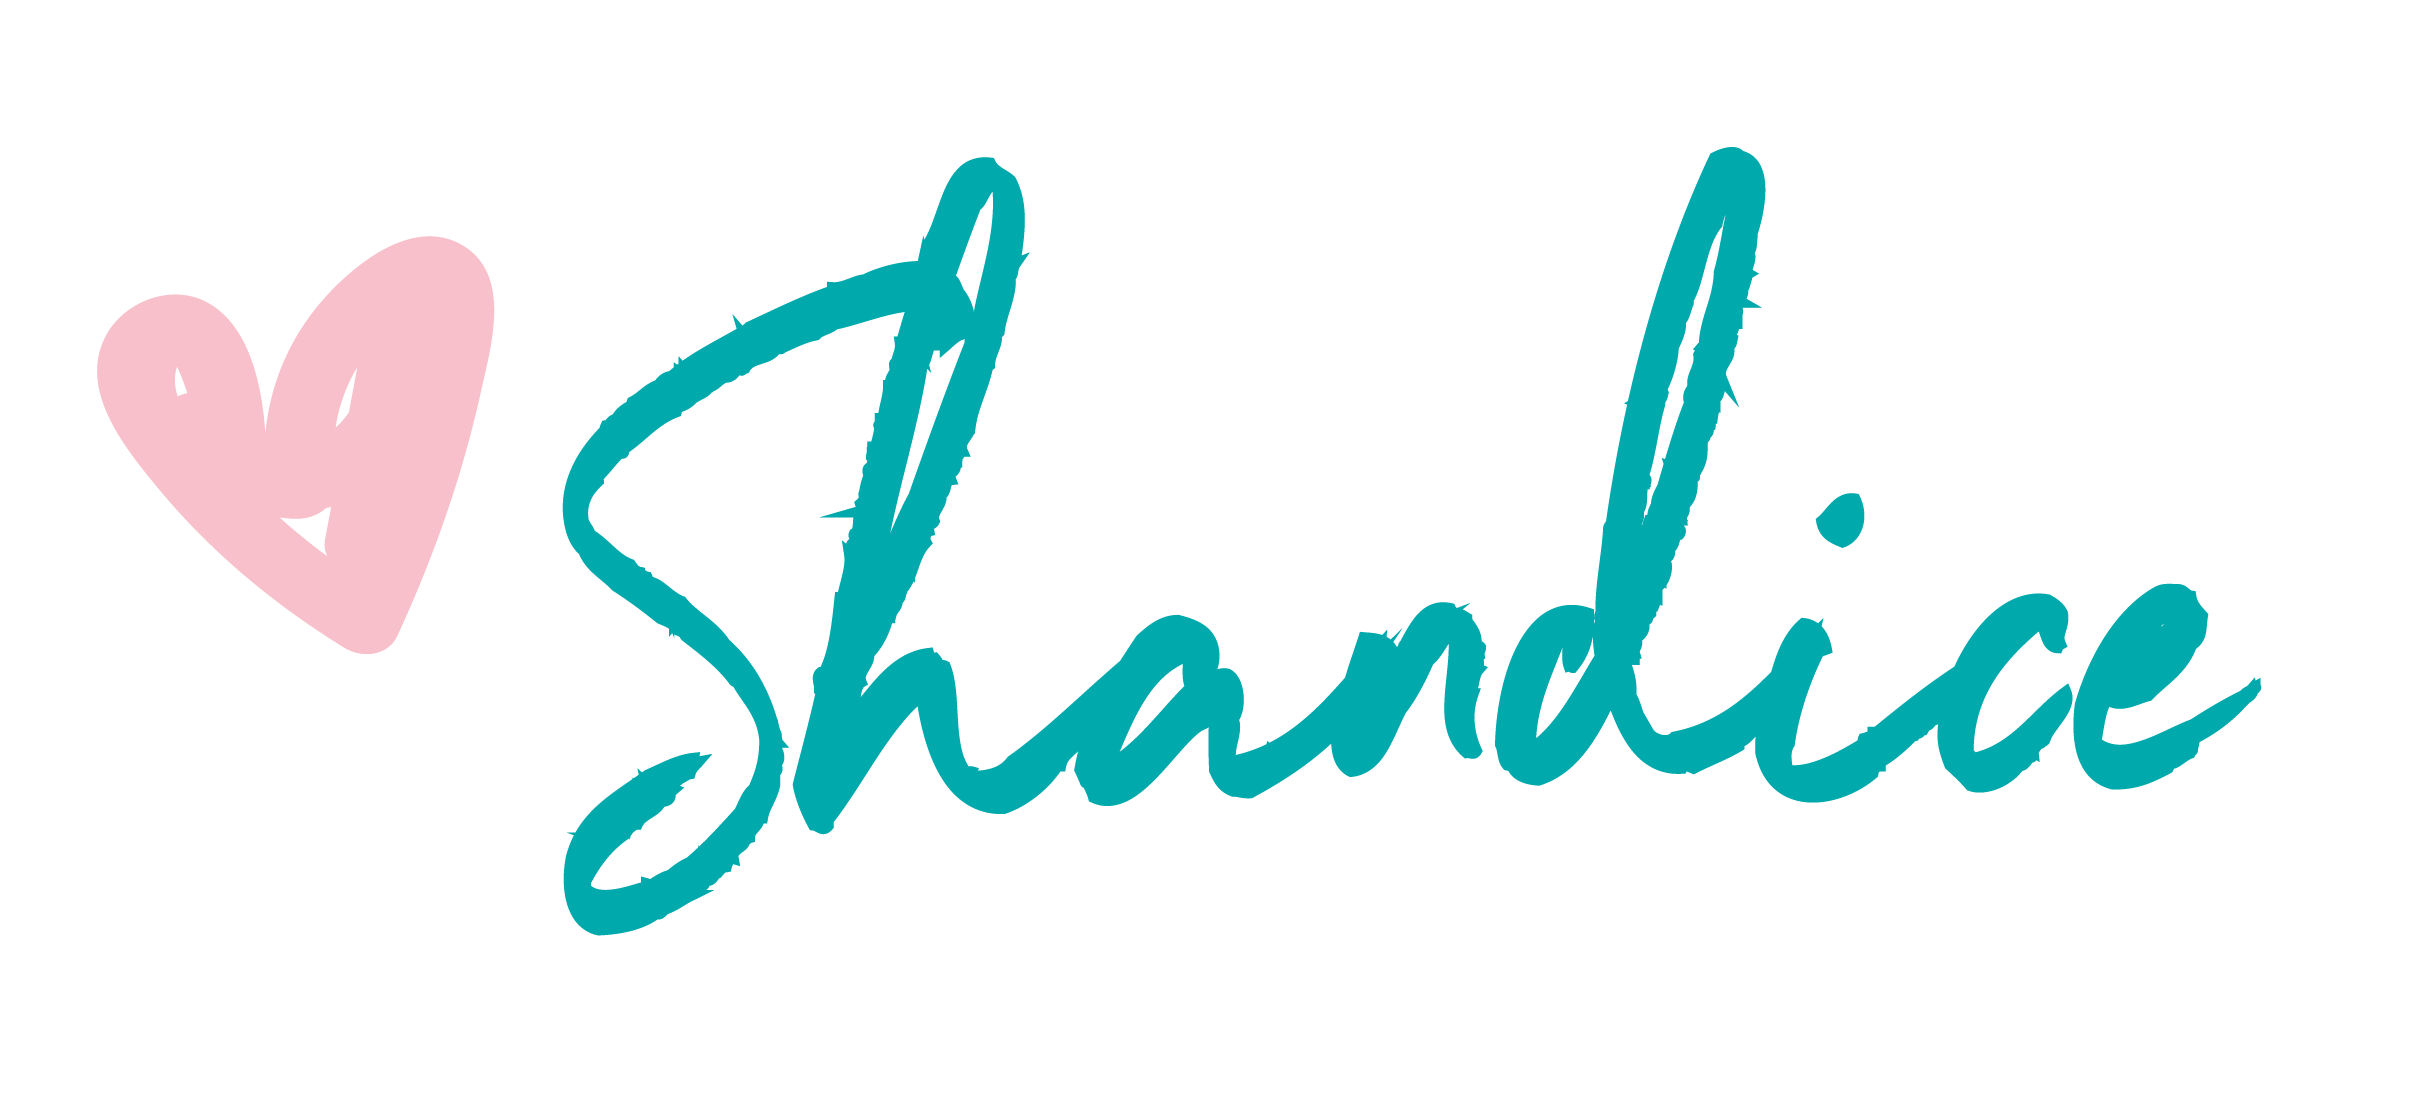 Copy of SS Web Elements_Shandice Sig.png